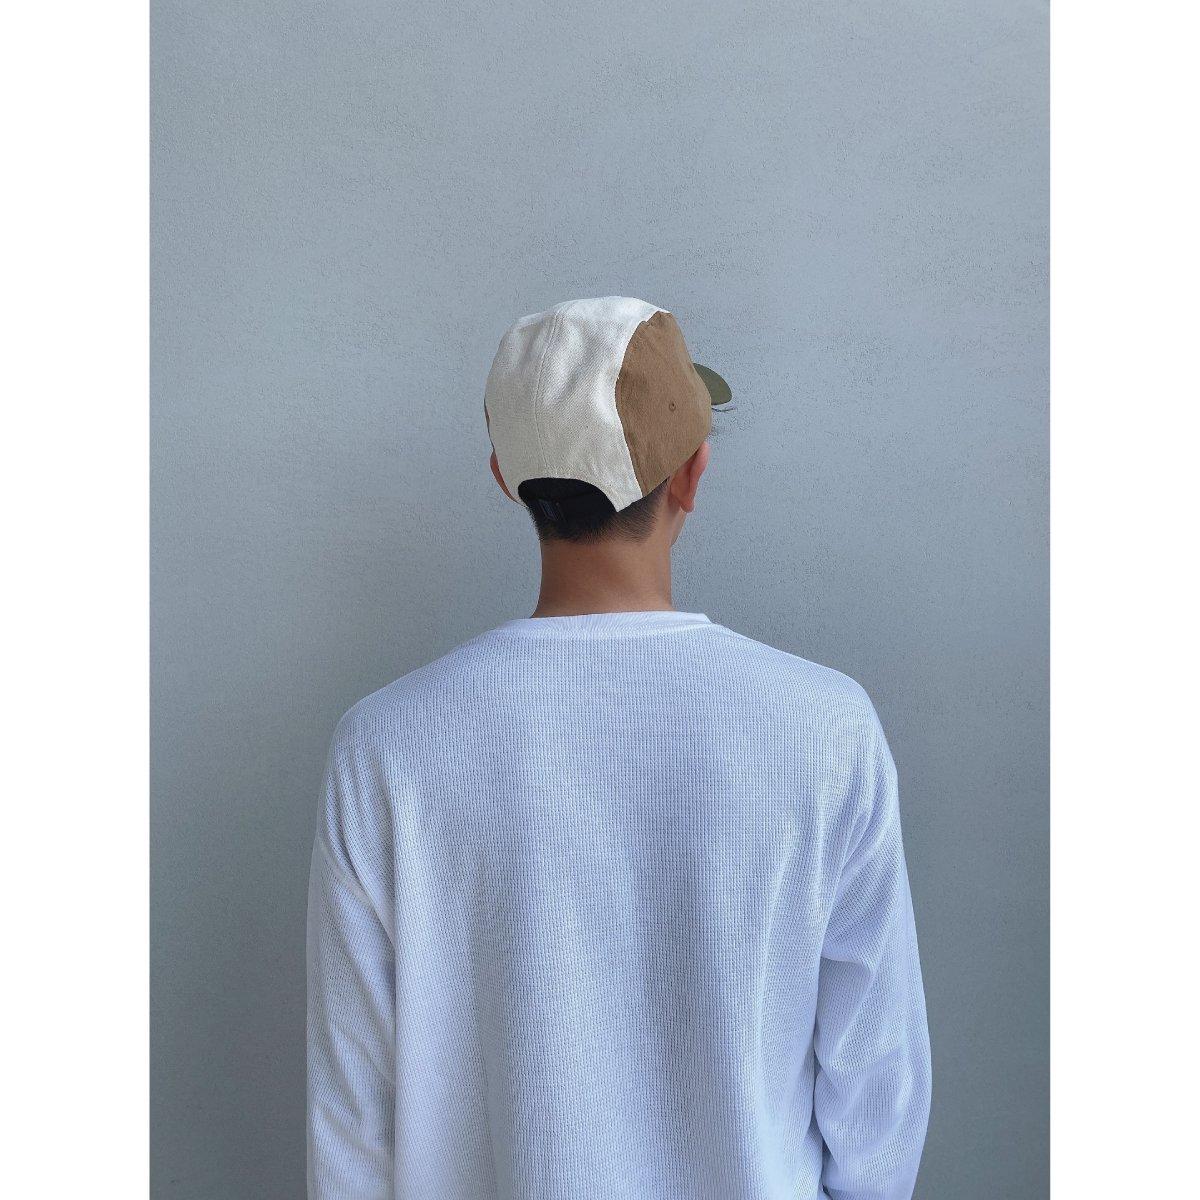 Repro Cap 詳細画像23